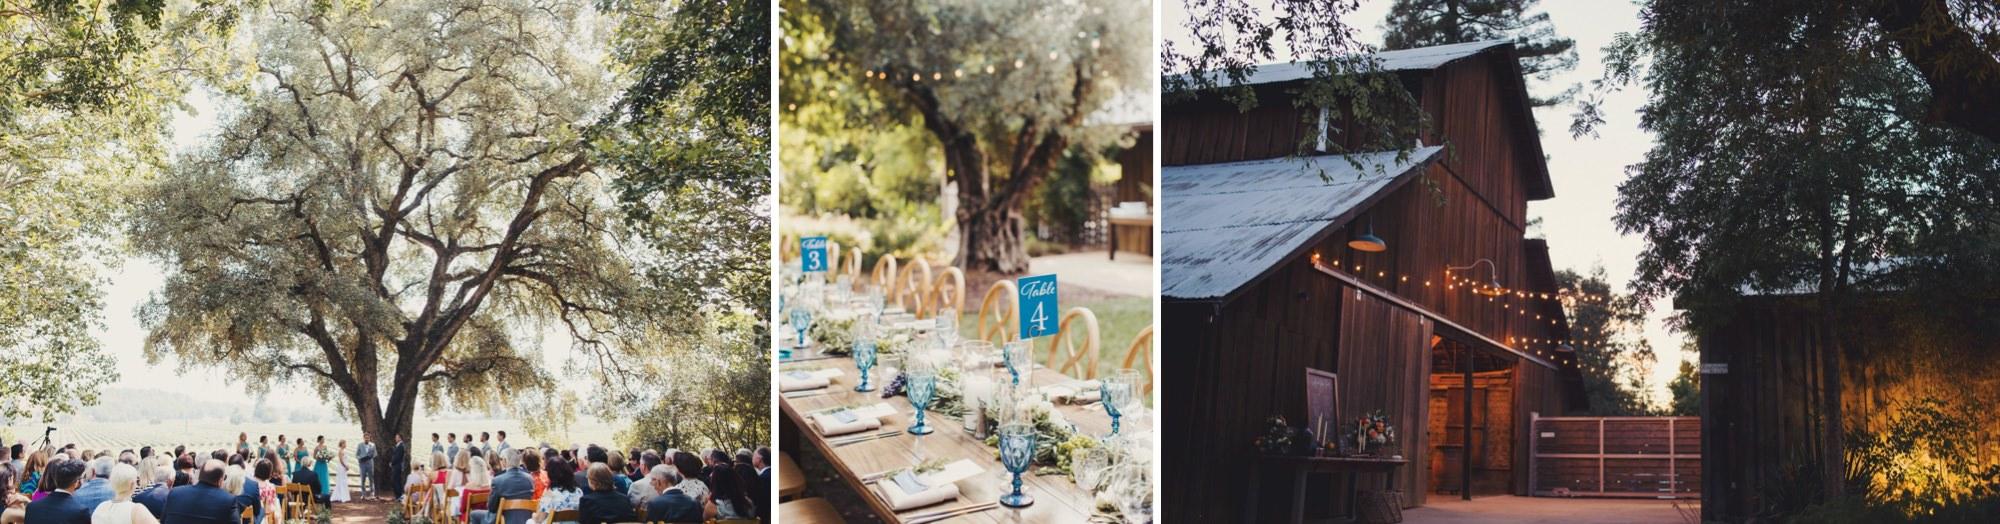 Barn wedding venue vineyard